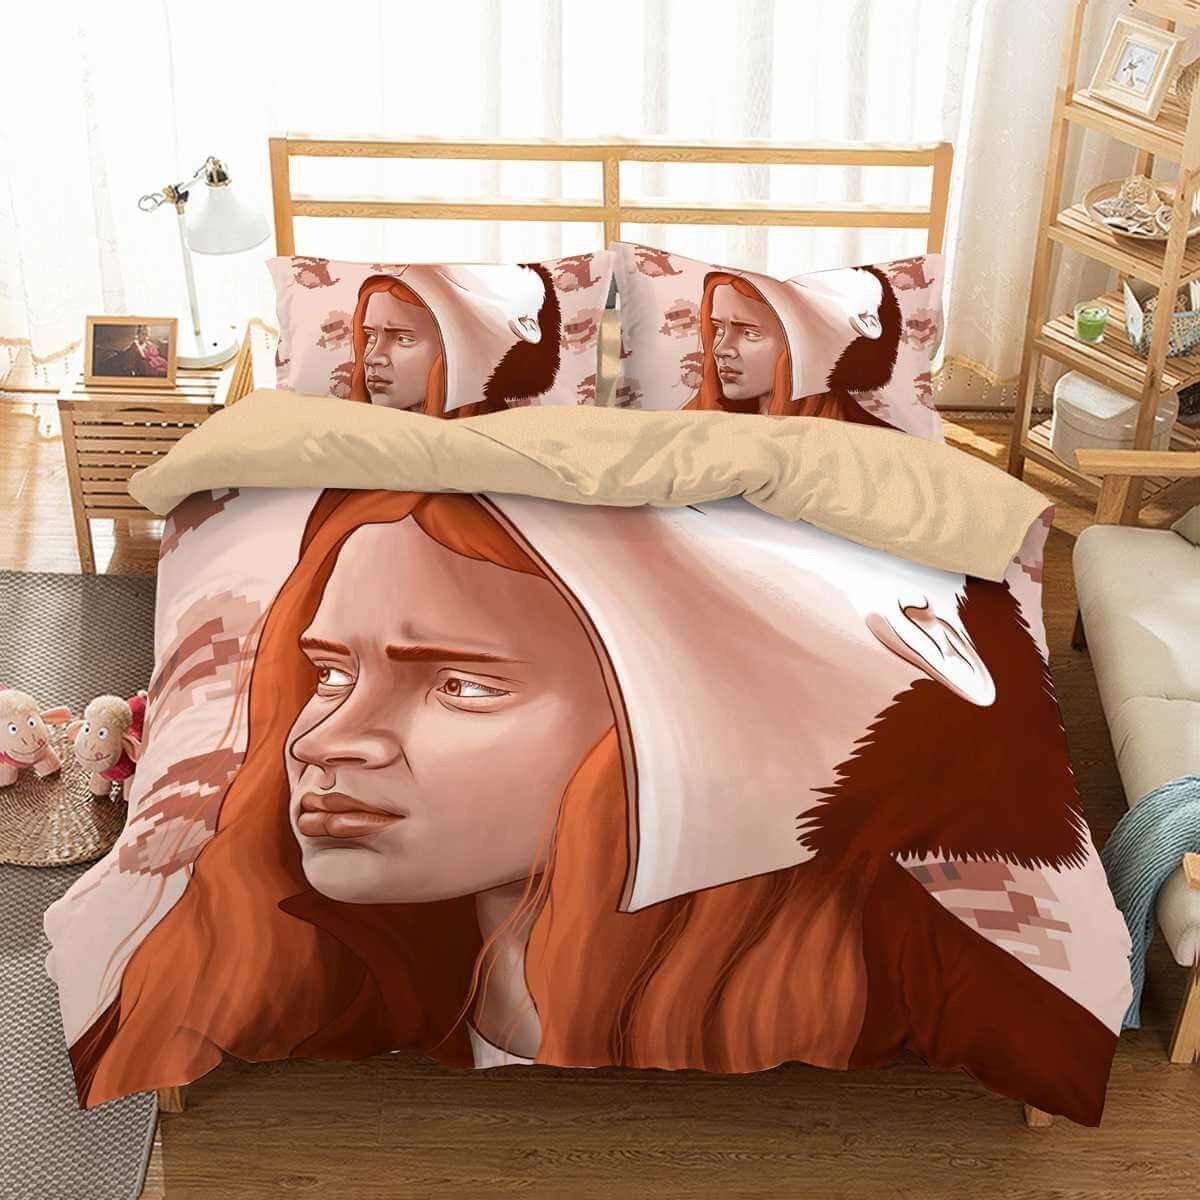 Bedroom Bedding and Curtain Set Unique 3d Customize Stranger Things Bedding Set Duvet Cover Set